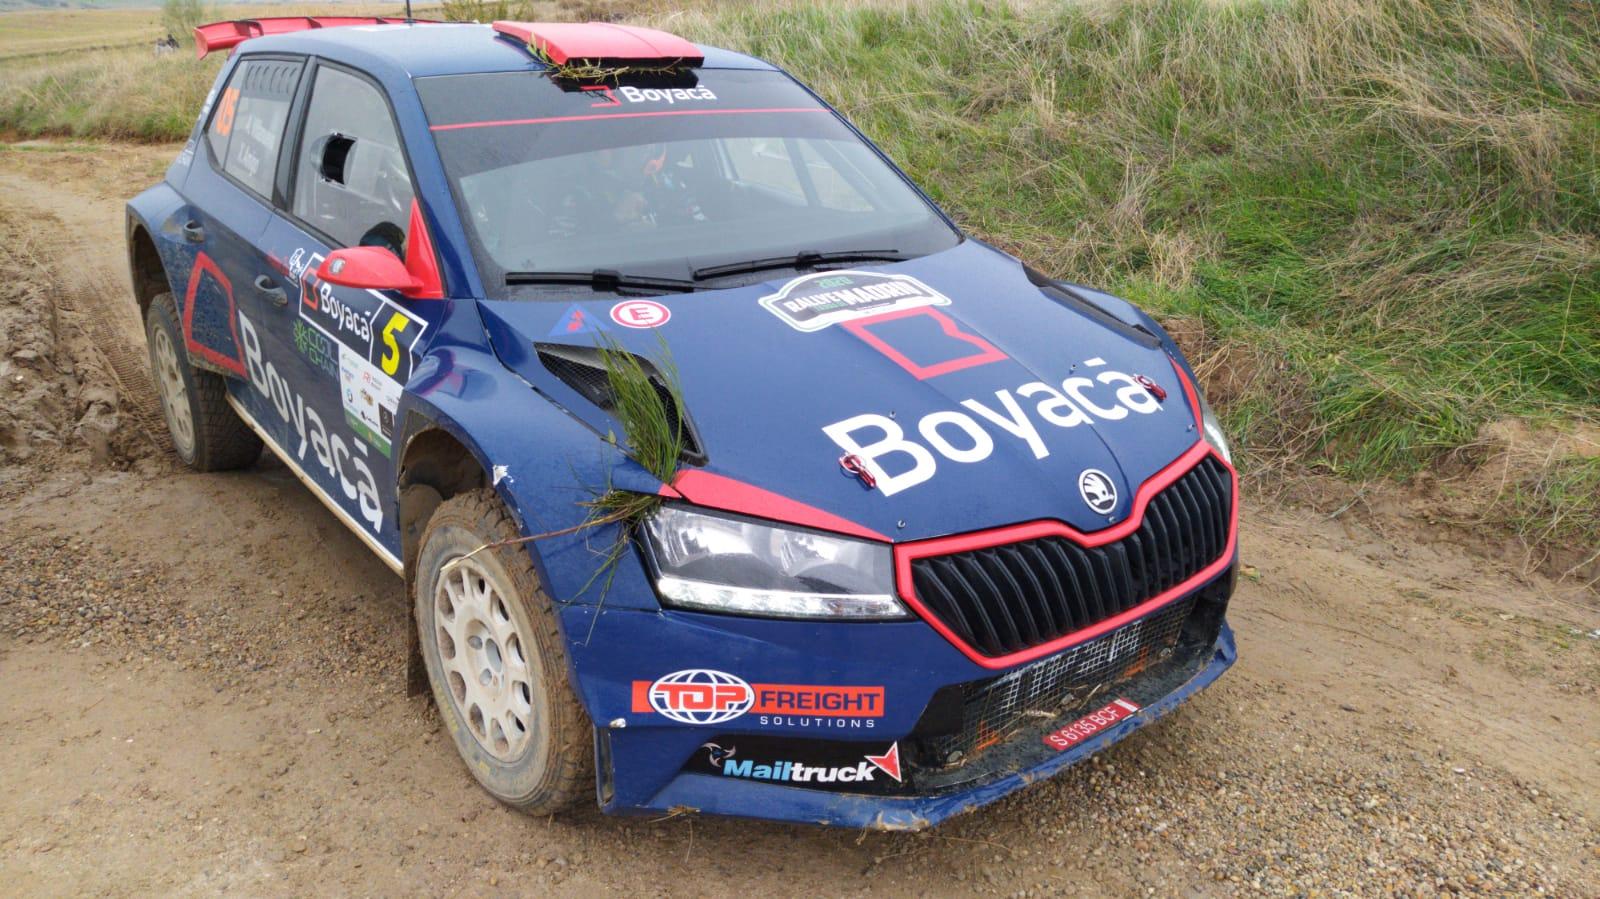 SCER + CERT: Rallye de Tierra de Madrid [13-14 Noviembre] - Página 3 20201114105709